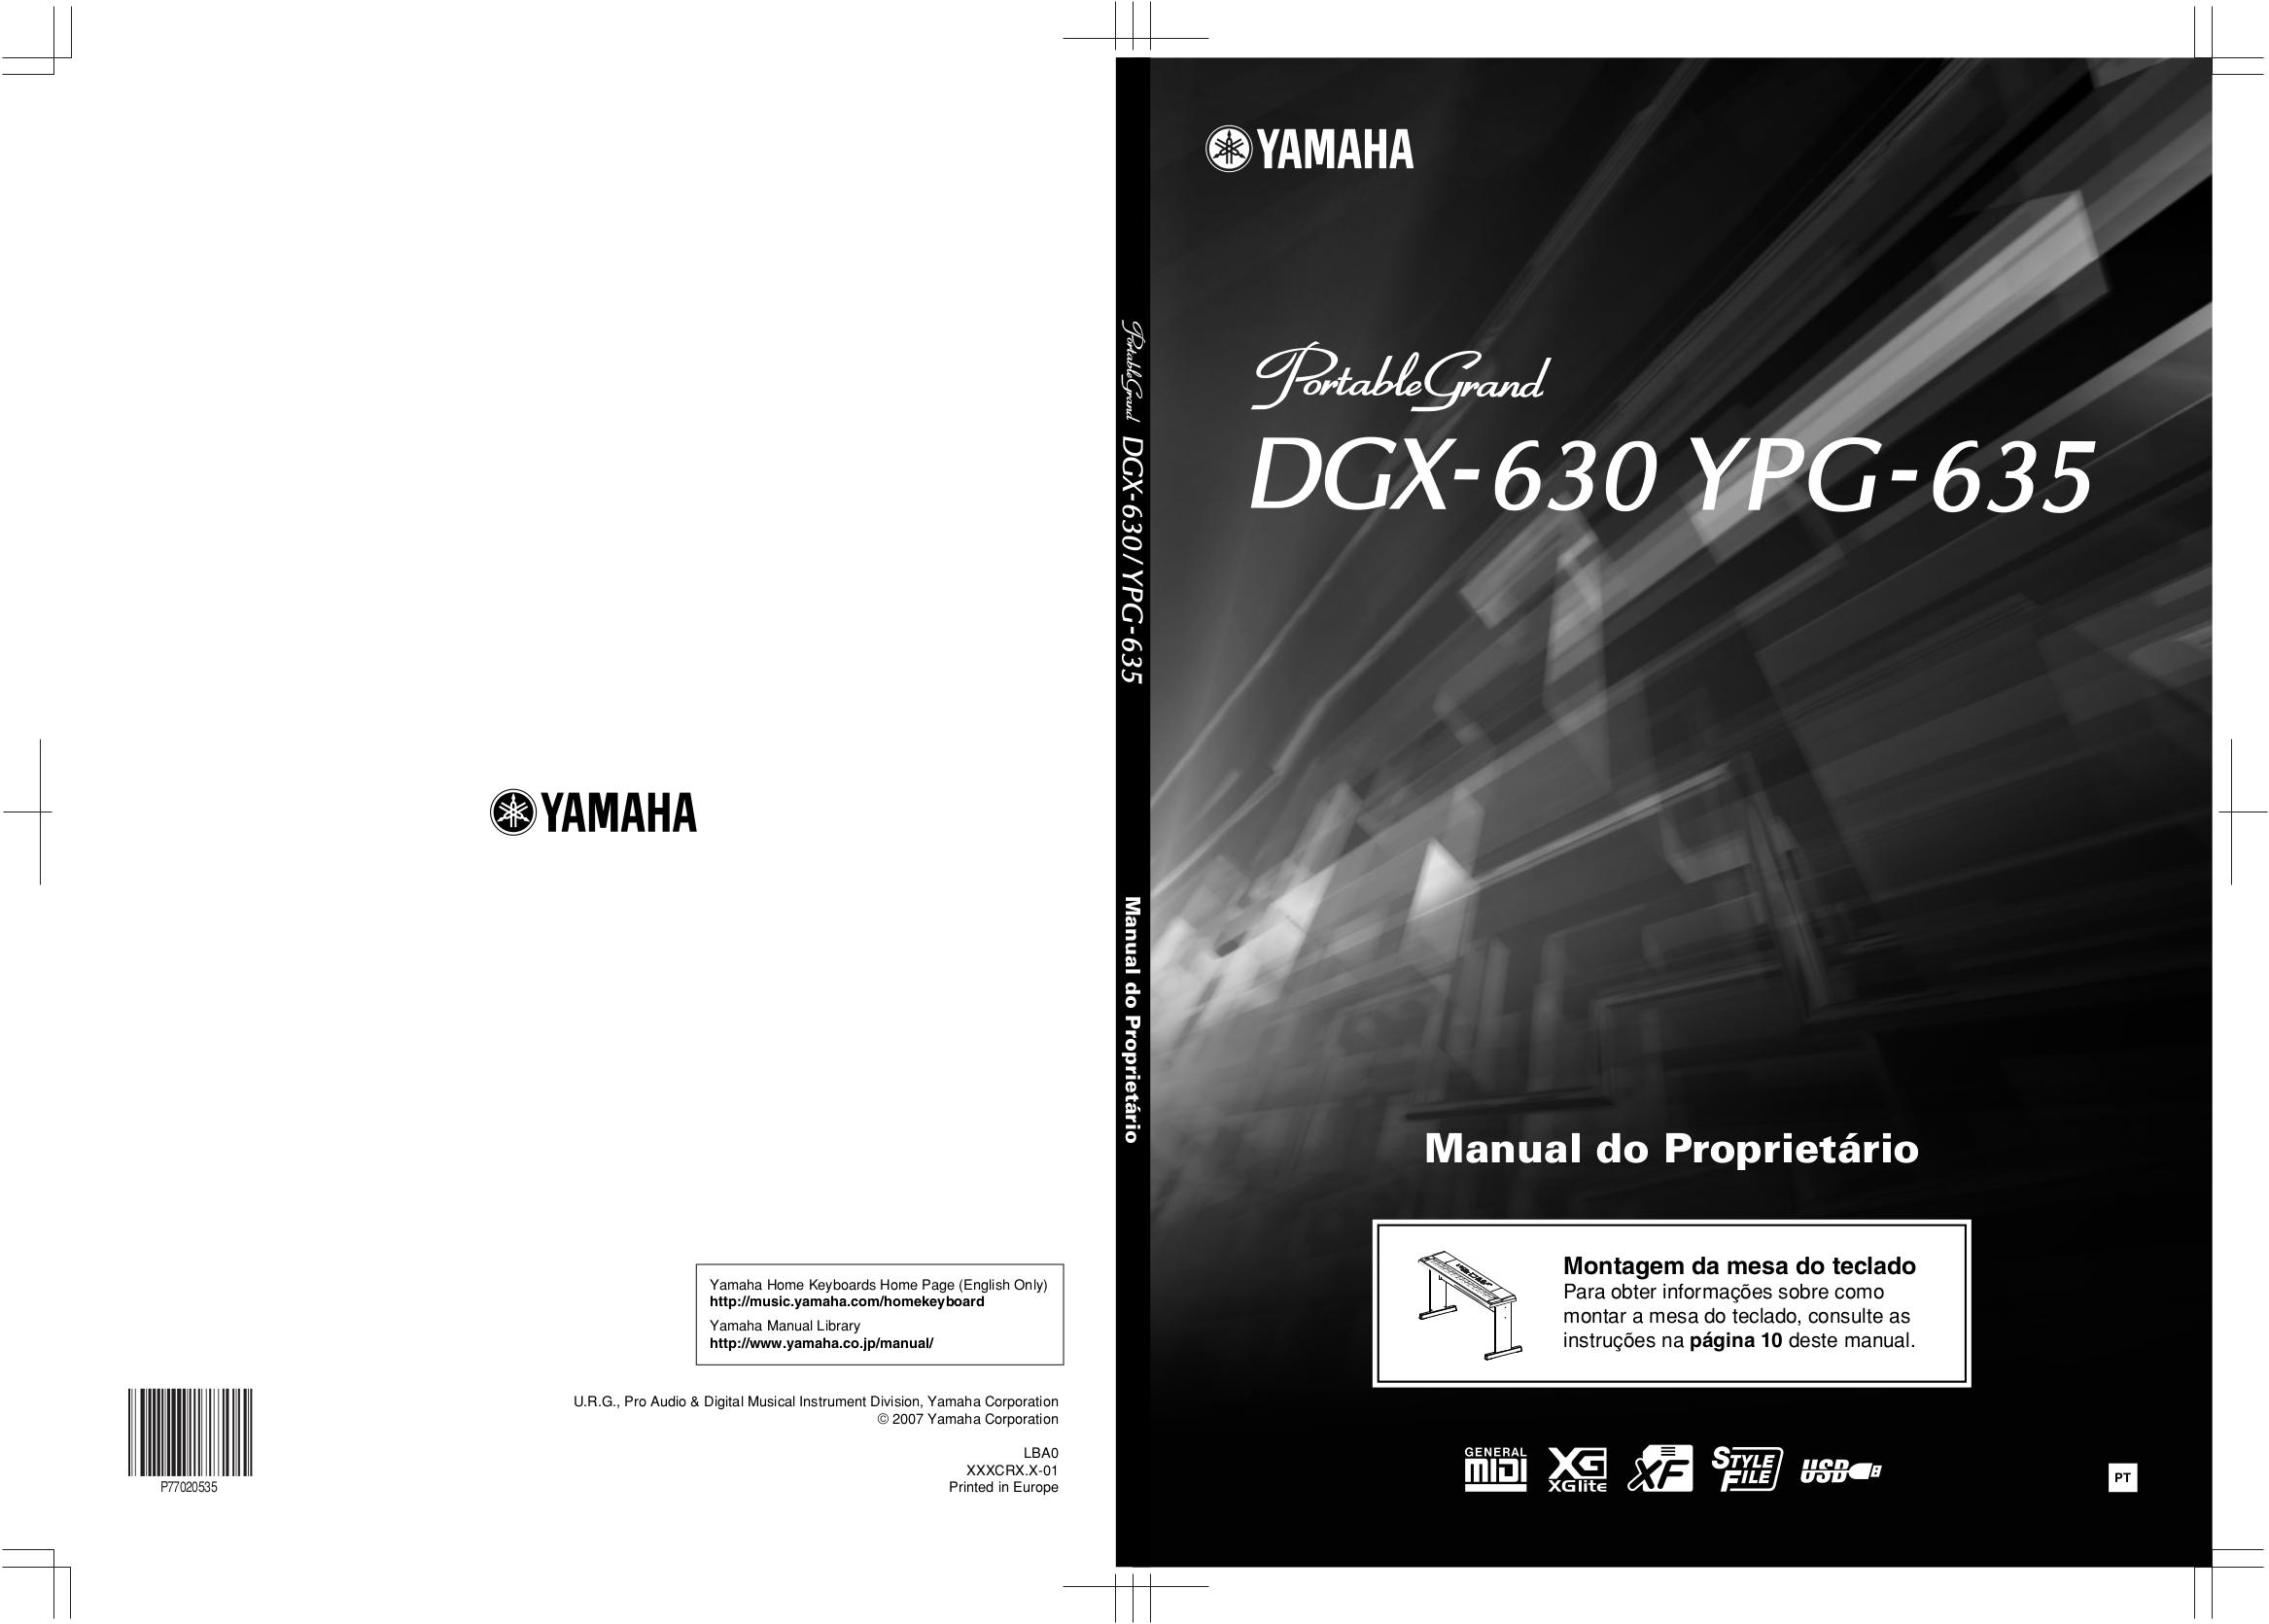 Pdf manual for yamaha music keyboard dgx 630 for Yamaha dgx 630 ypg 635